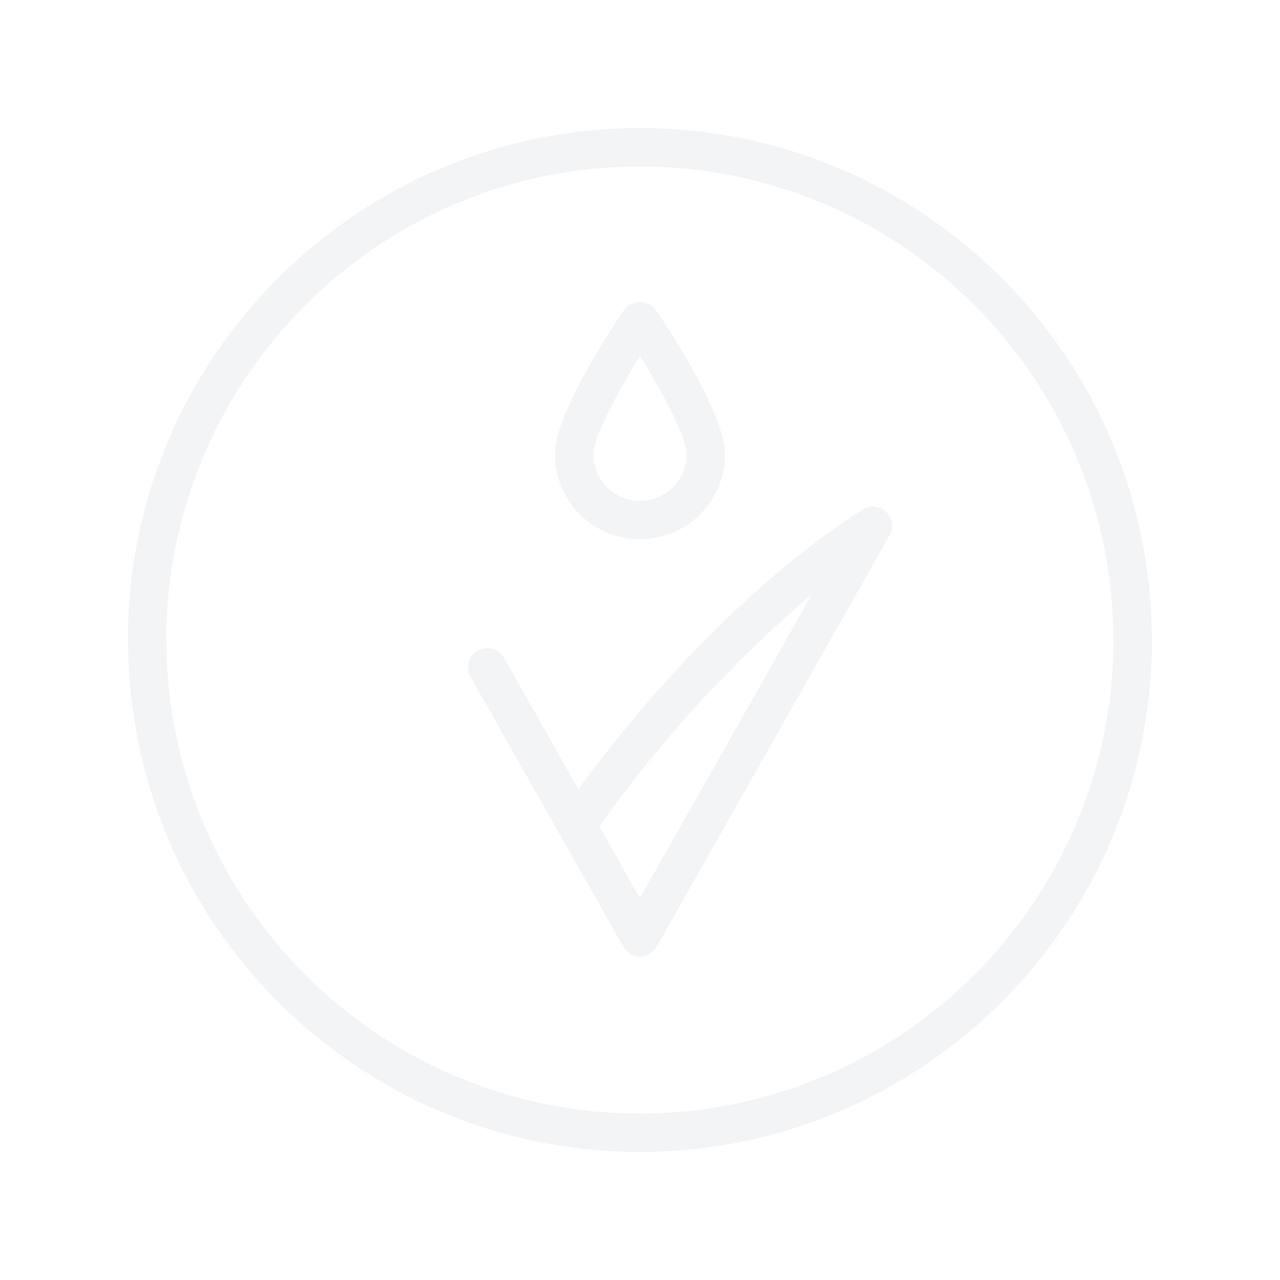 Roberto Cavalli Eau De Parfum EDP 30ml